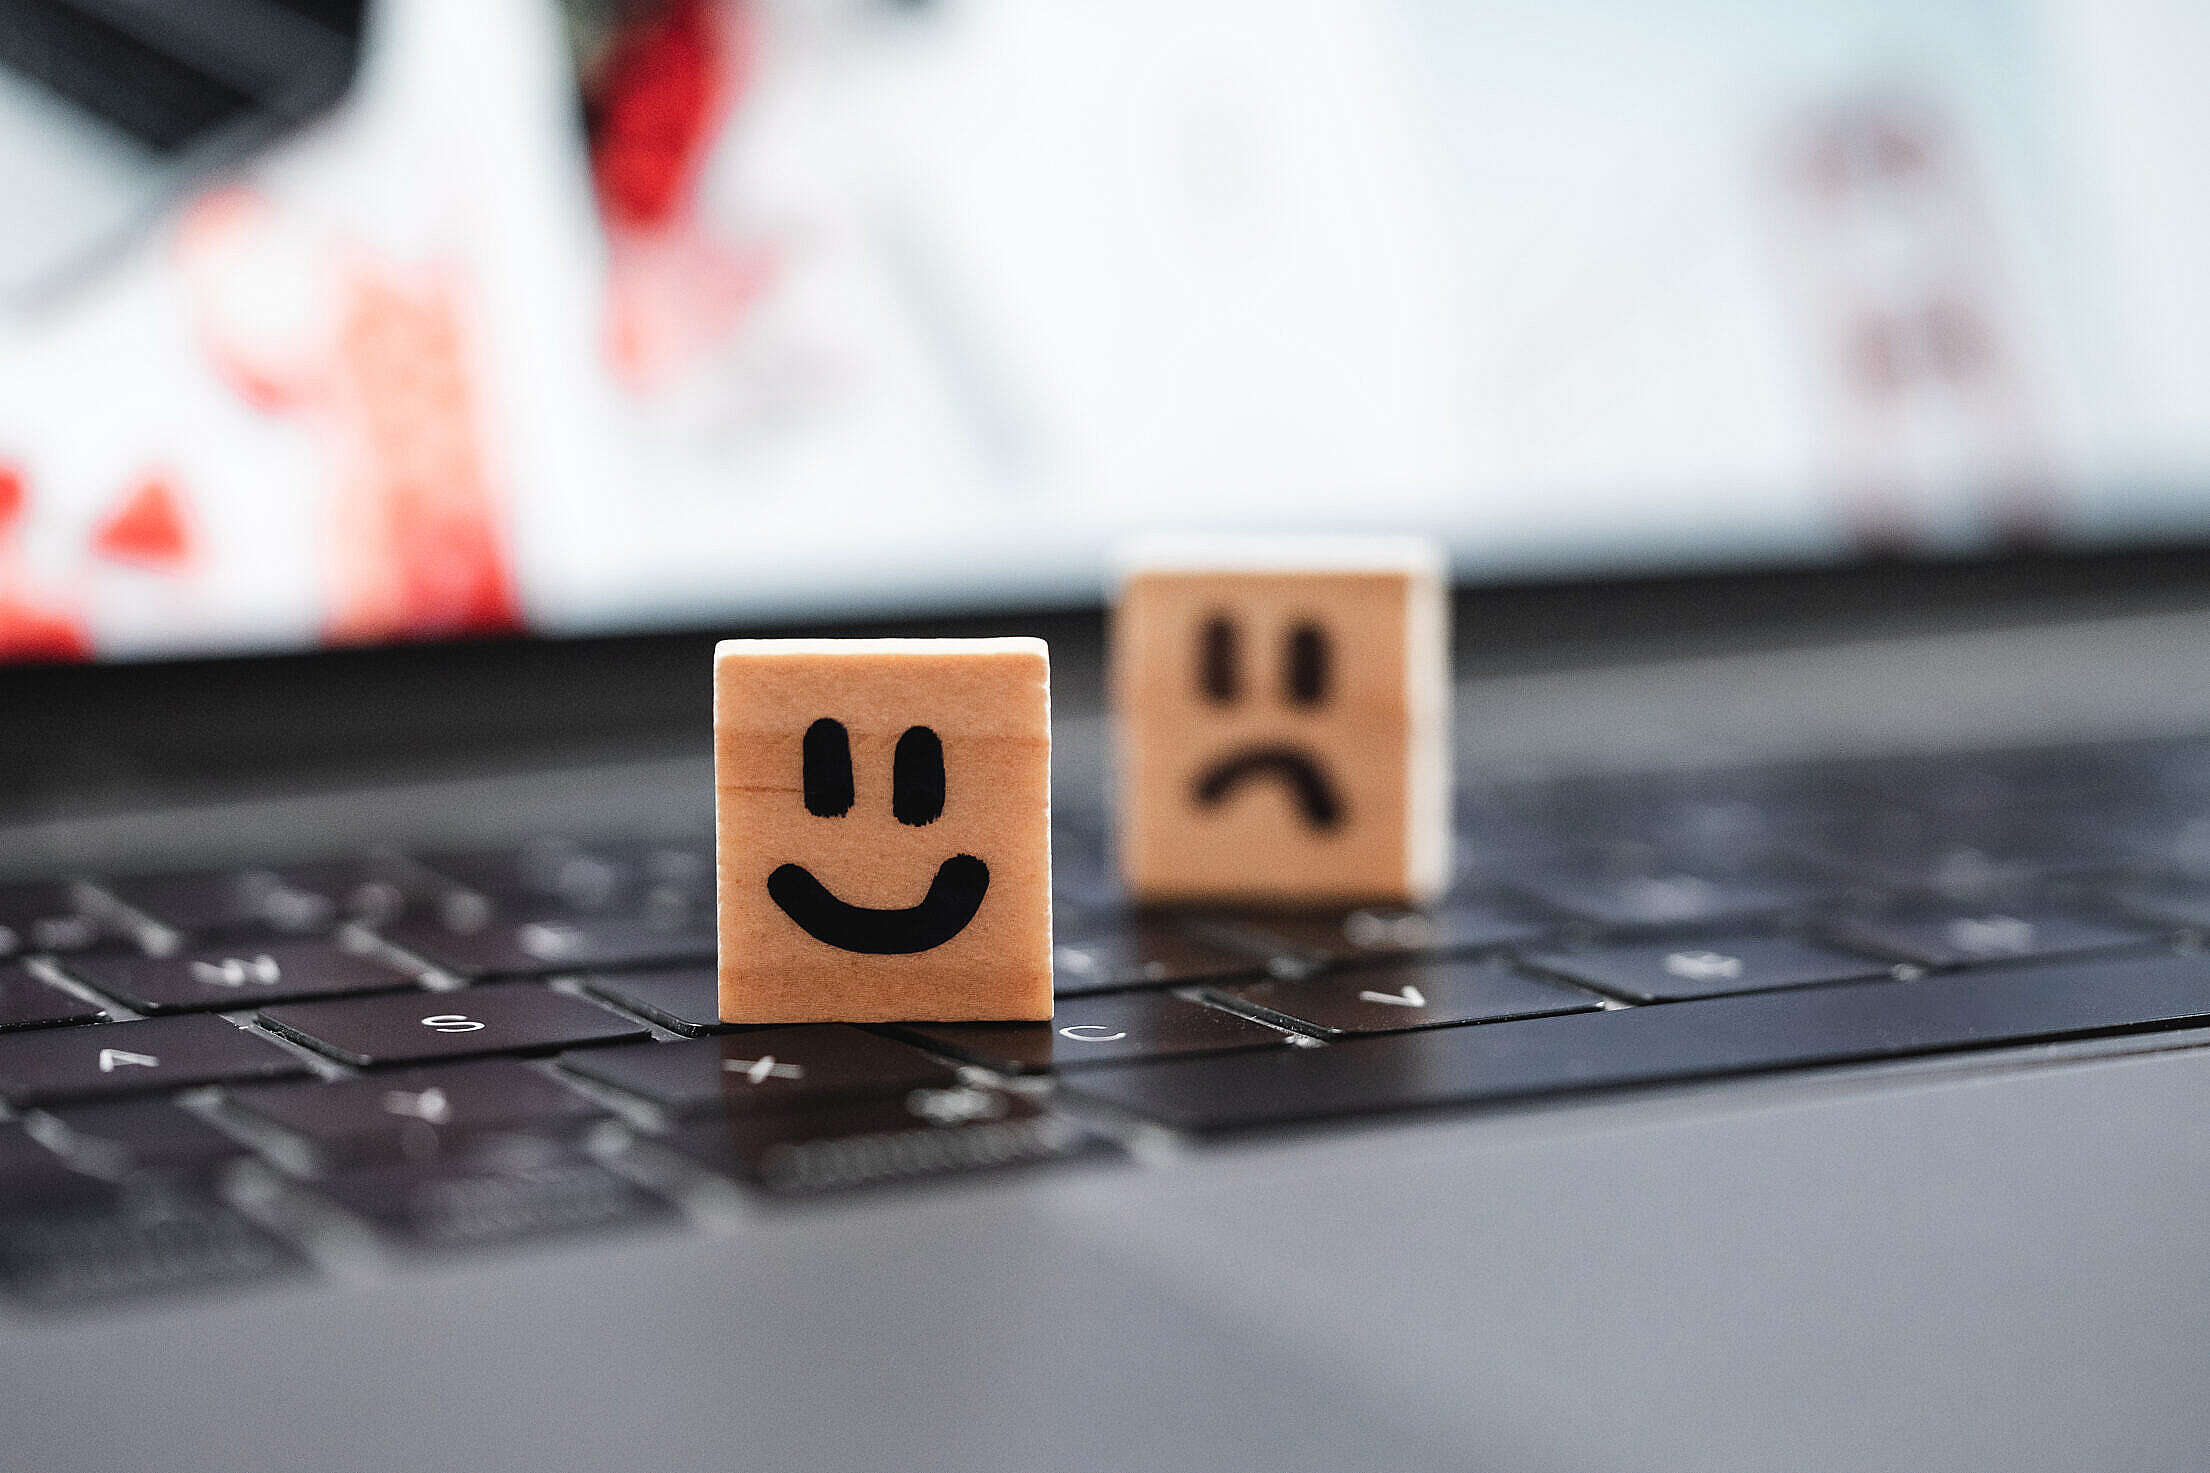 Happy and Sad Smiley on Laptop Keyboard Free Stock Photo